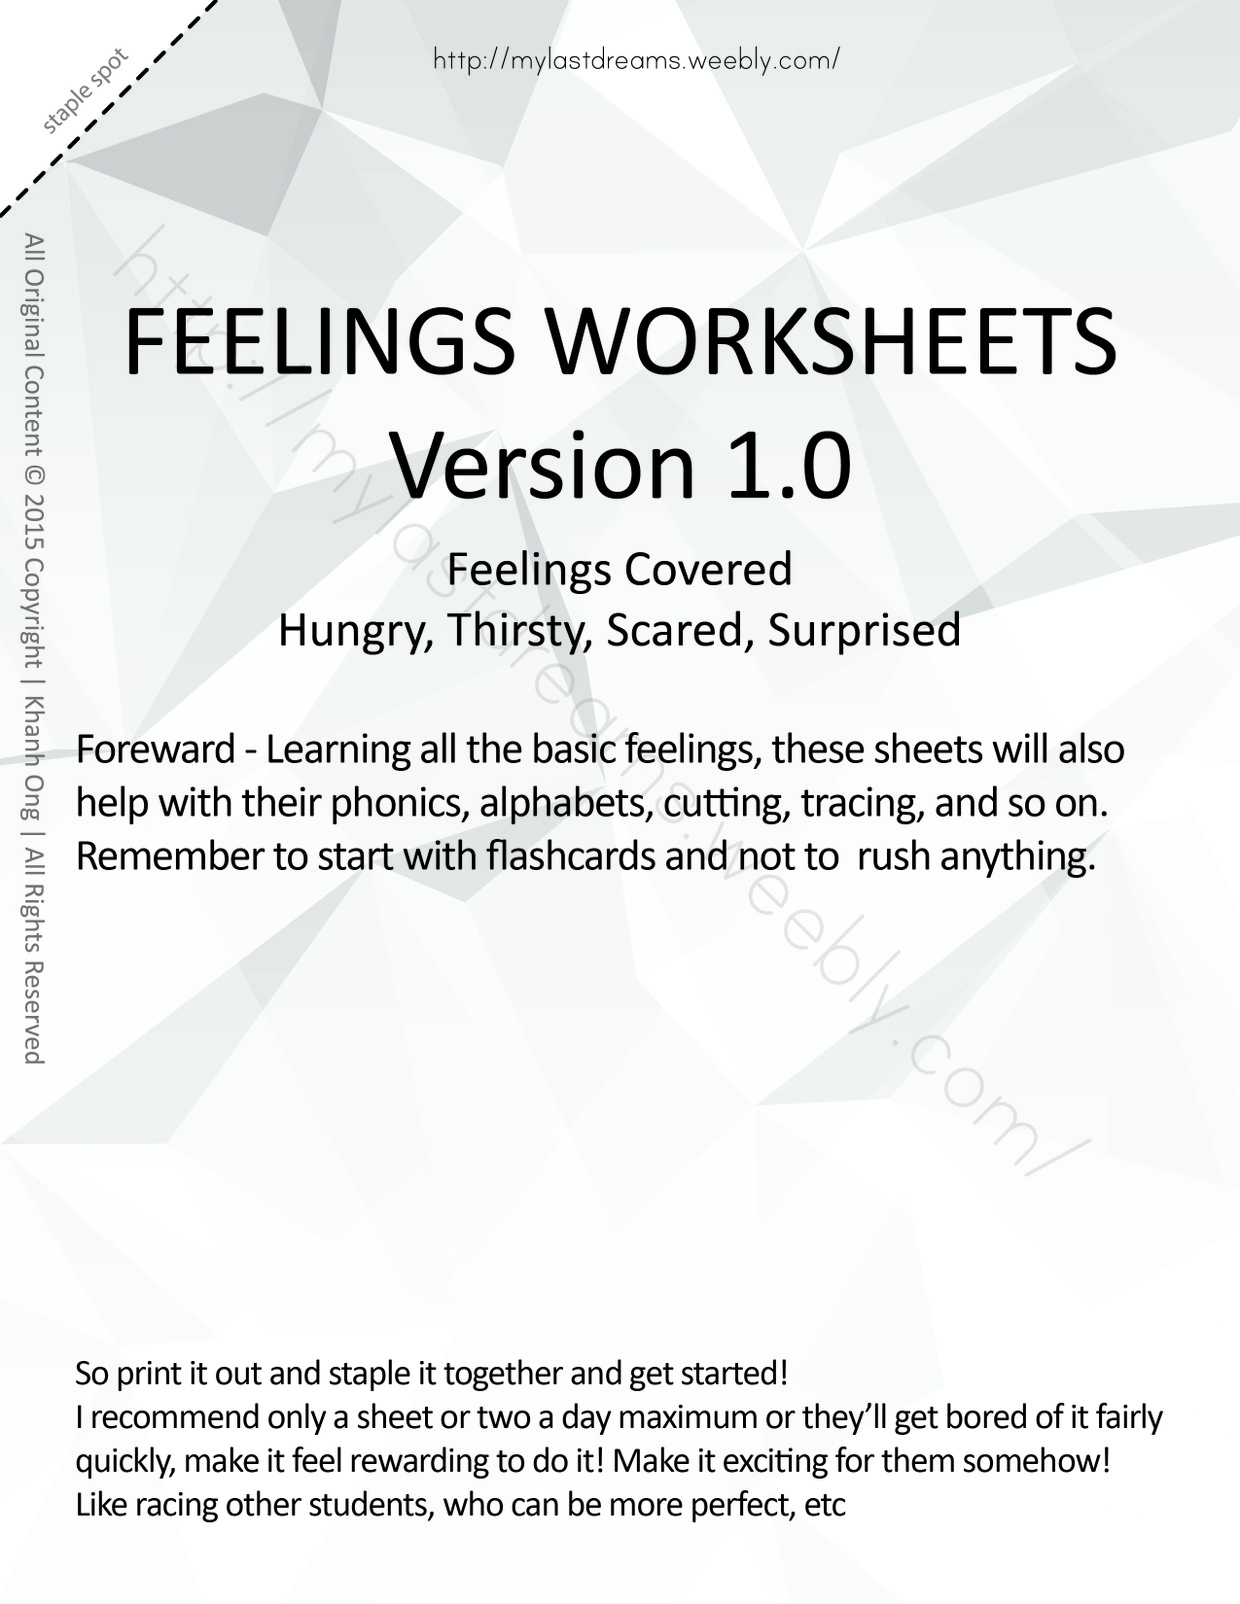 MLD - Basic Feeling Worksheets - Part 3 - Letter Sized